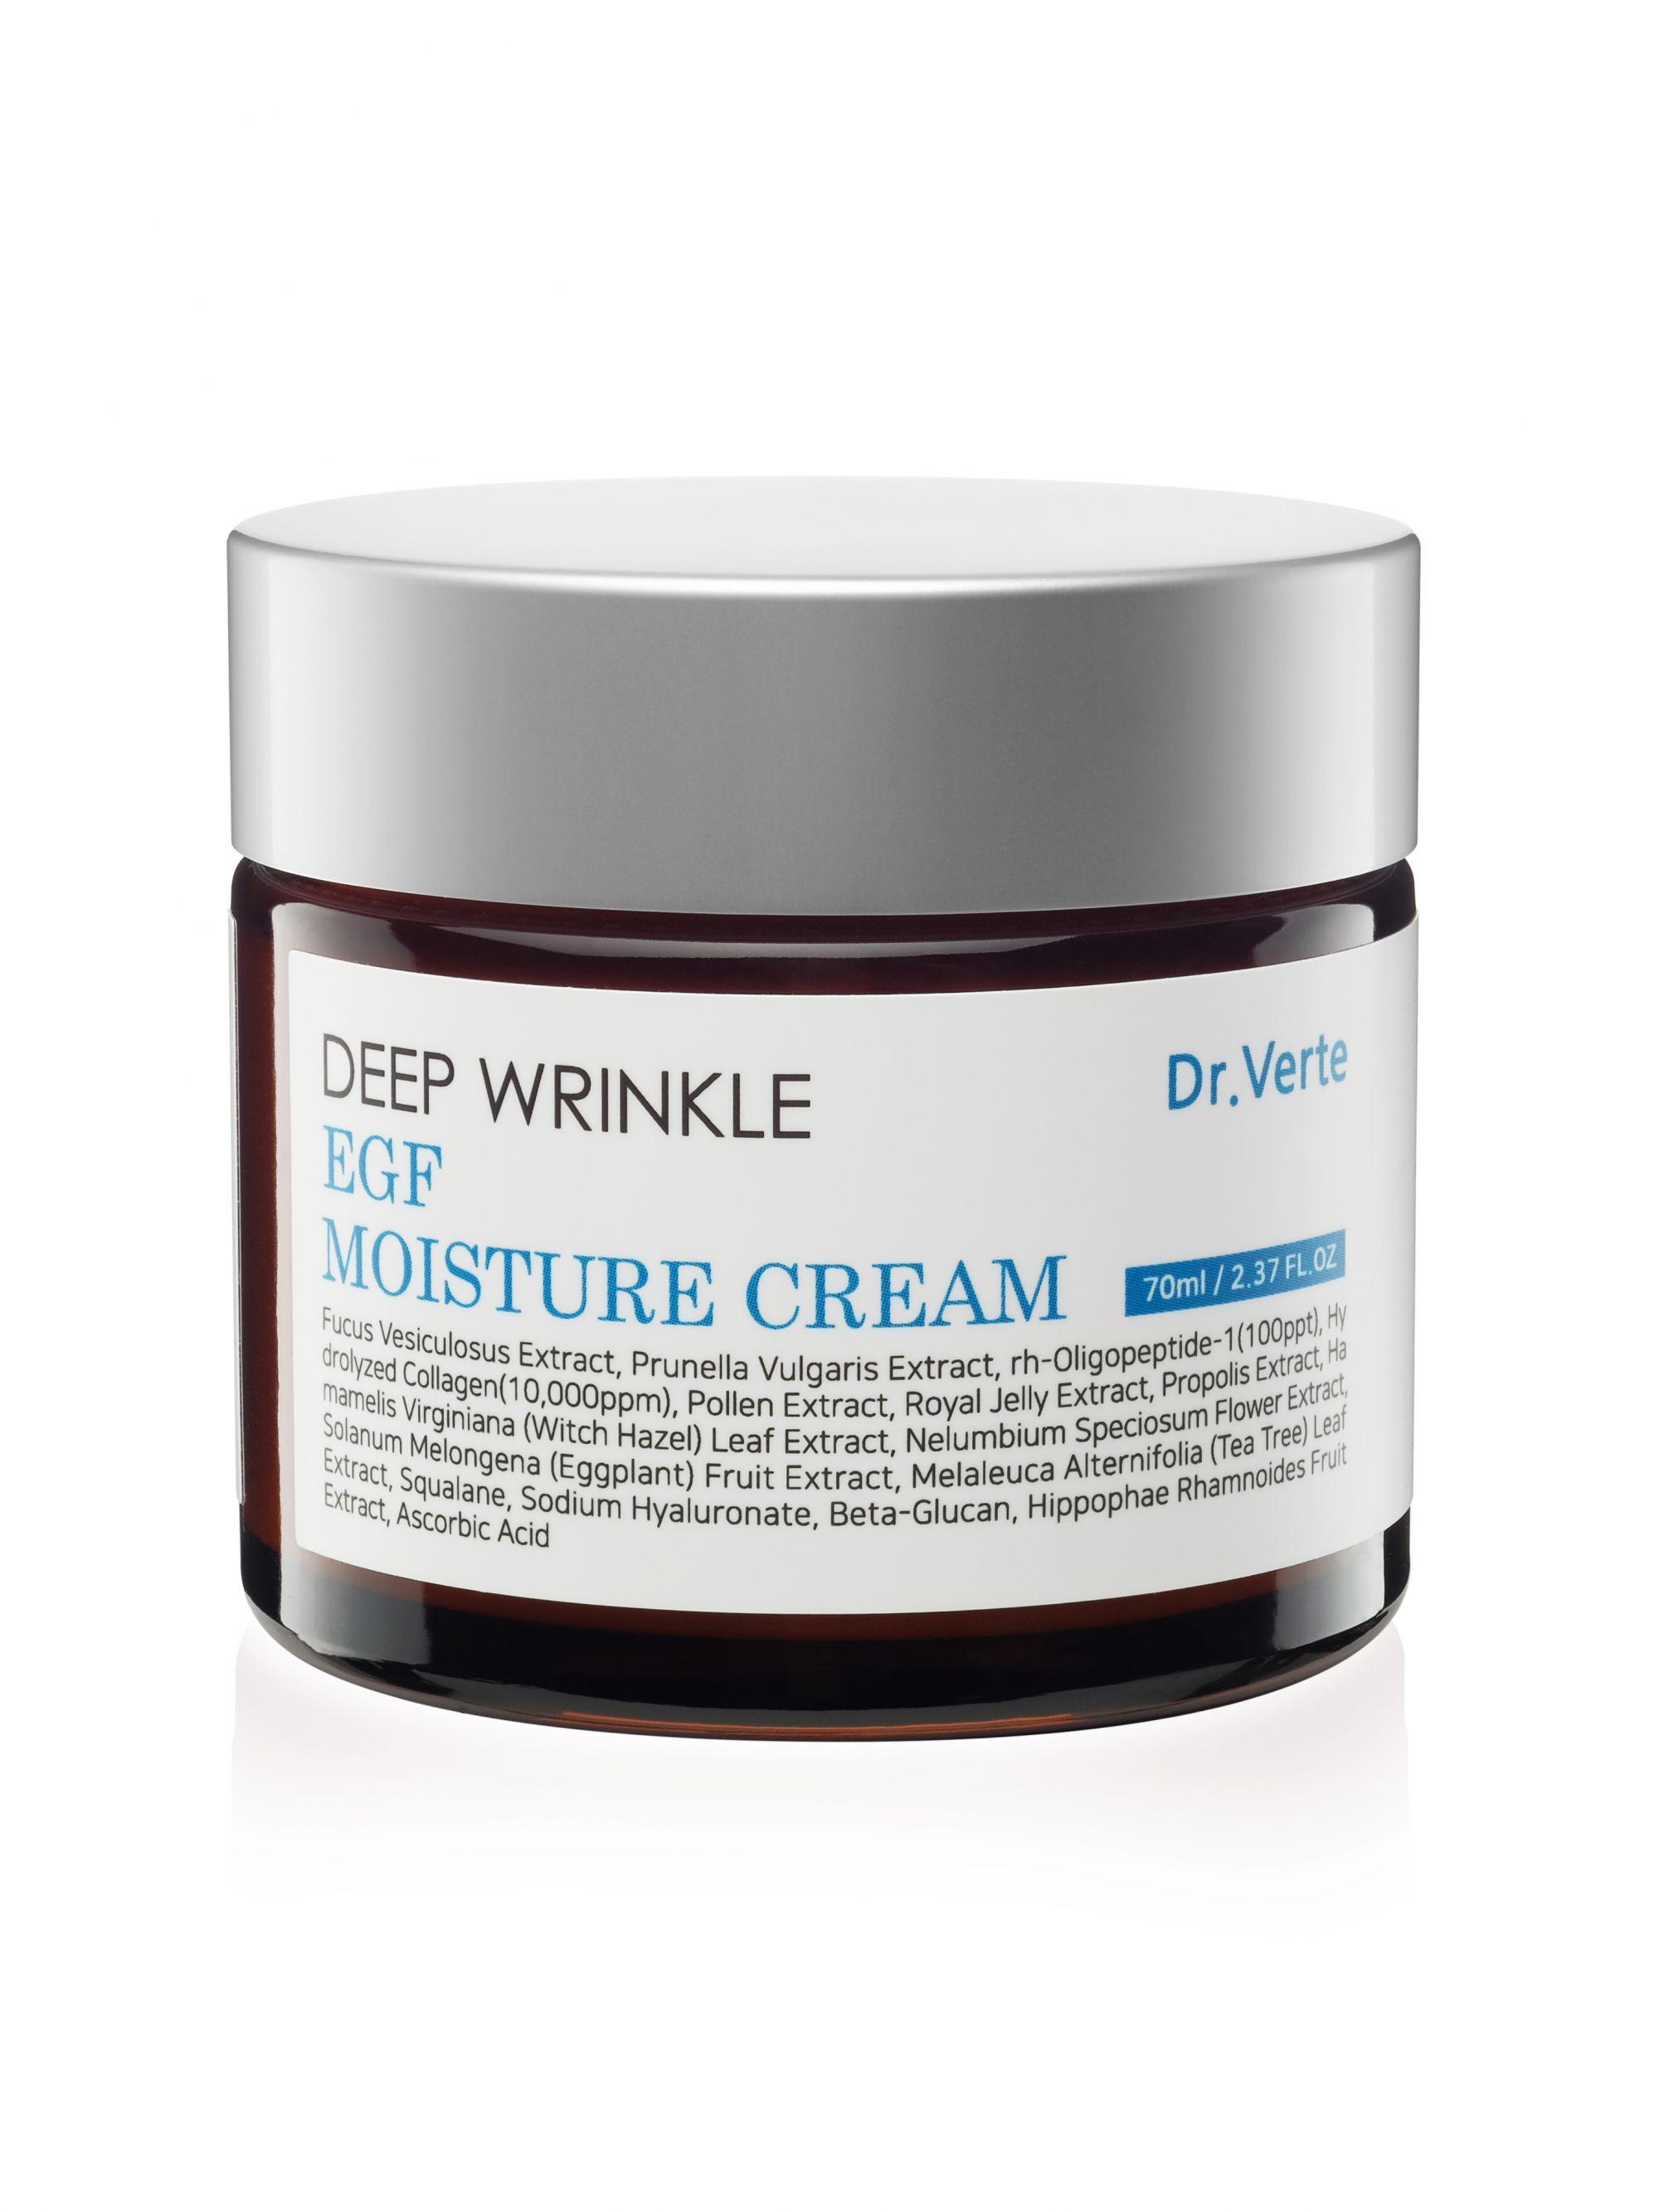 Купить Крем для лица Dr.Verte омолаживающий DEEP WRINKLE EGF MOISTURE CREAM 70 мл, Dr.Verte_05